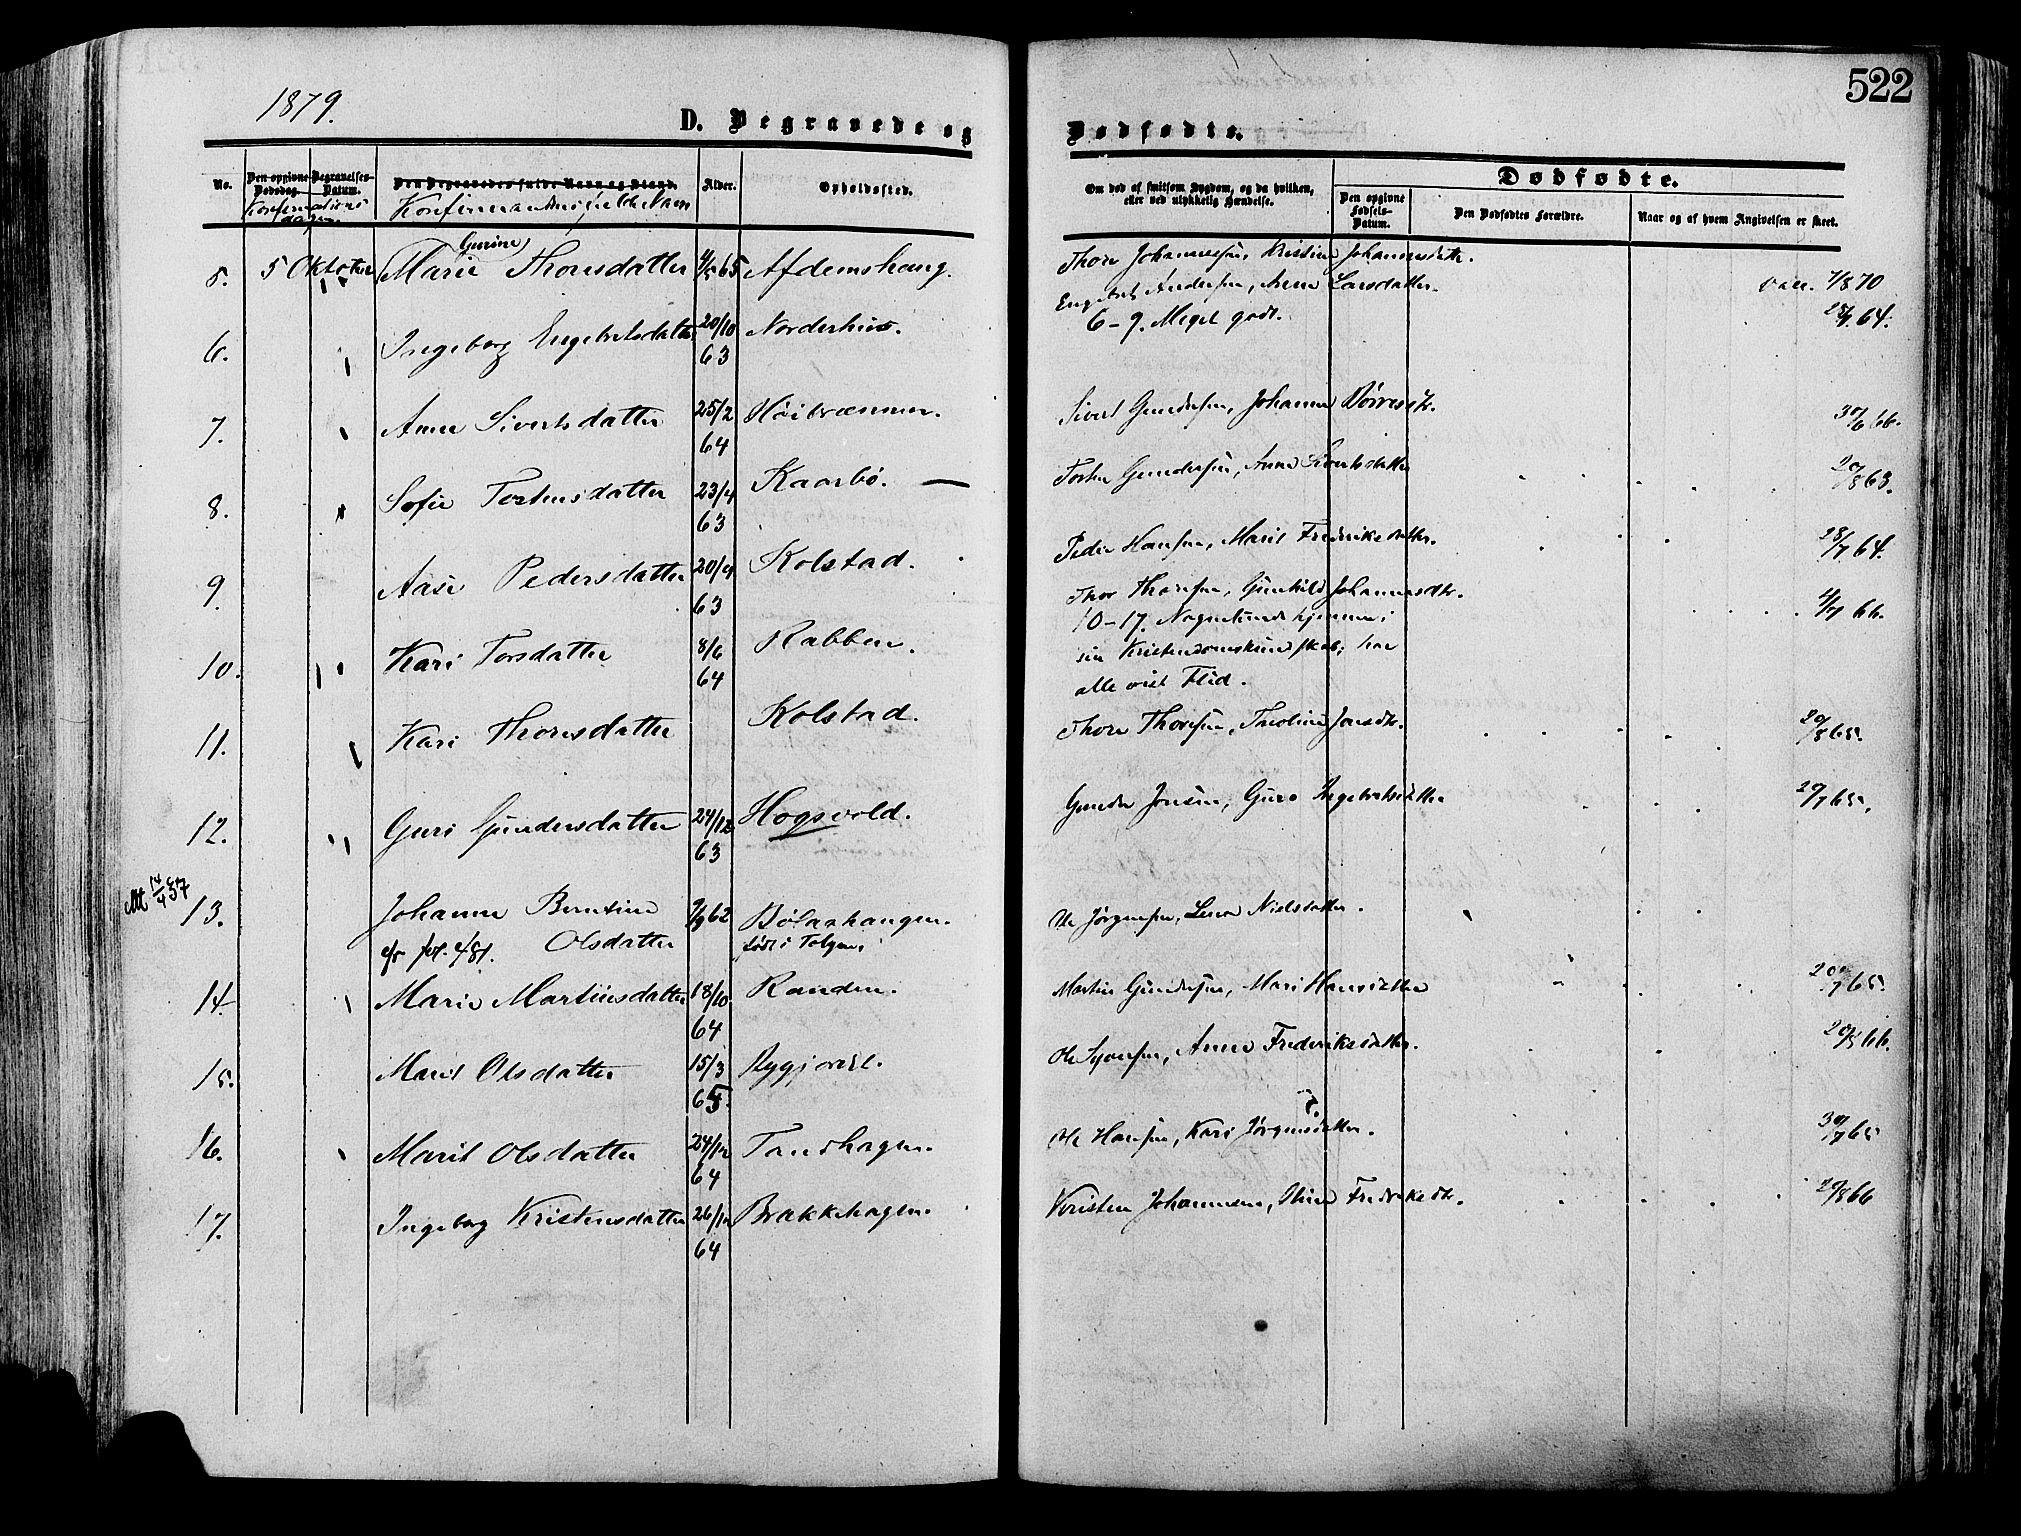 SAH, Lesja prestekontor, Ministerialbok nr. 8, 1854-1880, s. 522